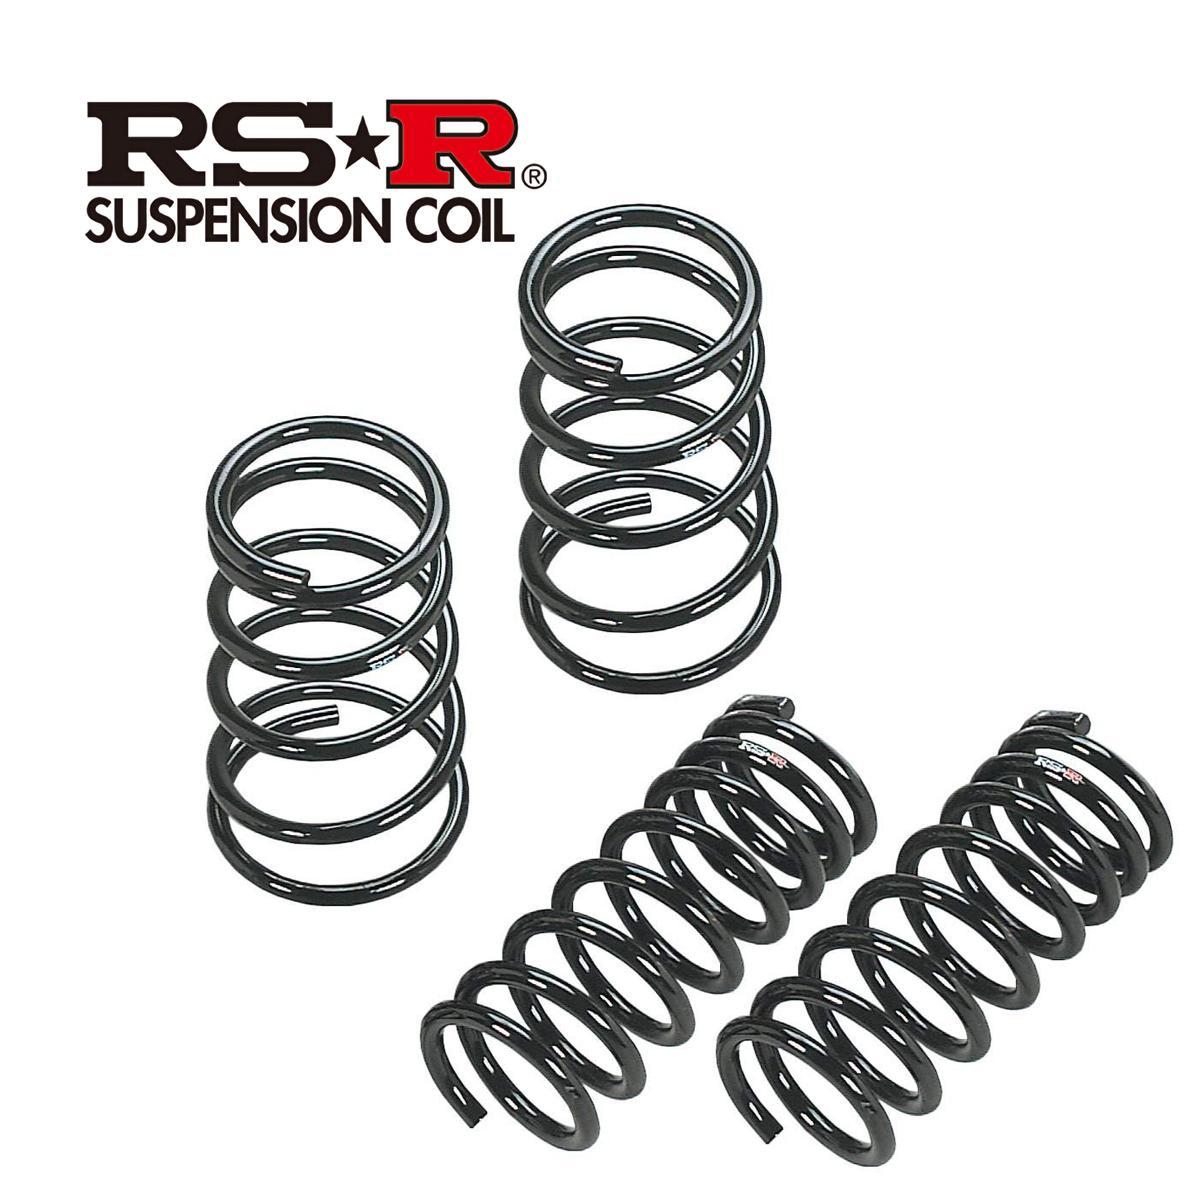 RS-R GS450h バージョンL GWL10 ダウンサス スプリング フロント T175DF RSR ダウン RSR 個人宅発送追金有